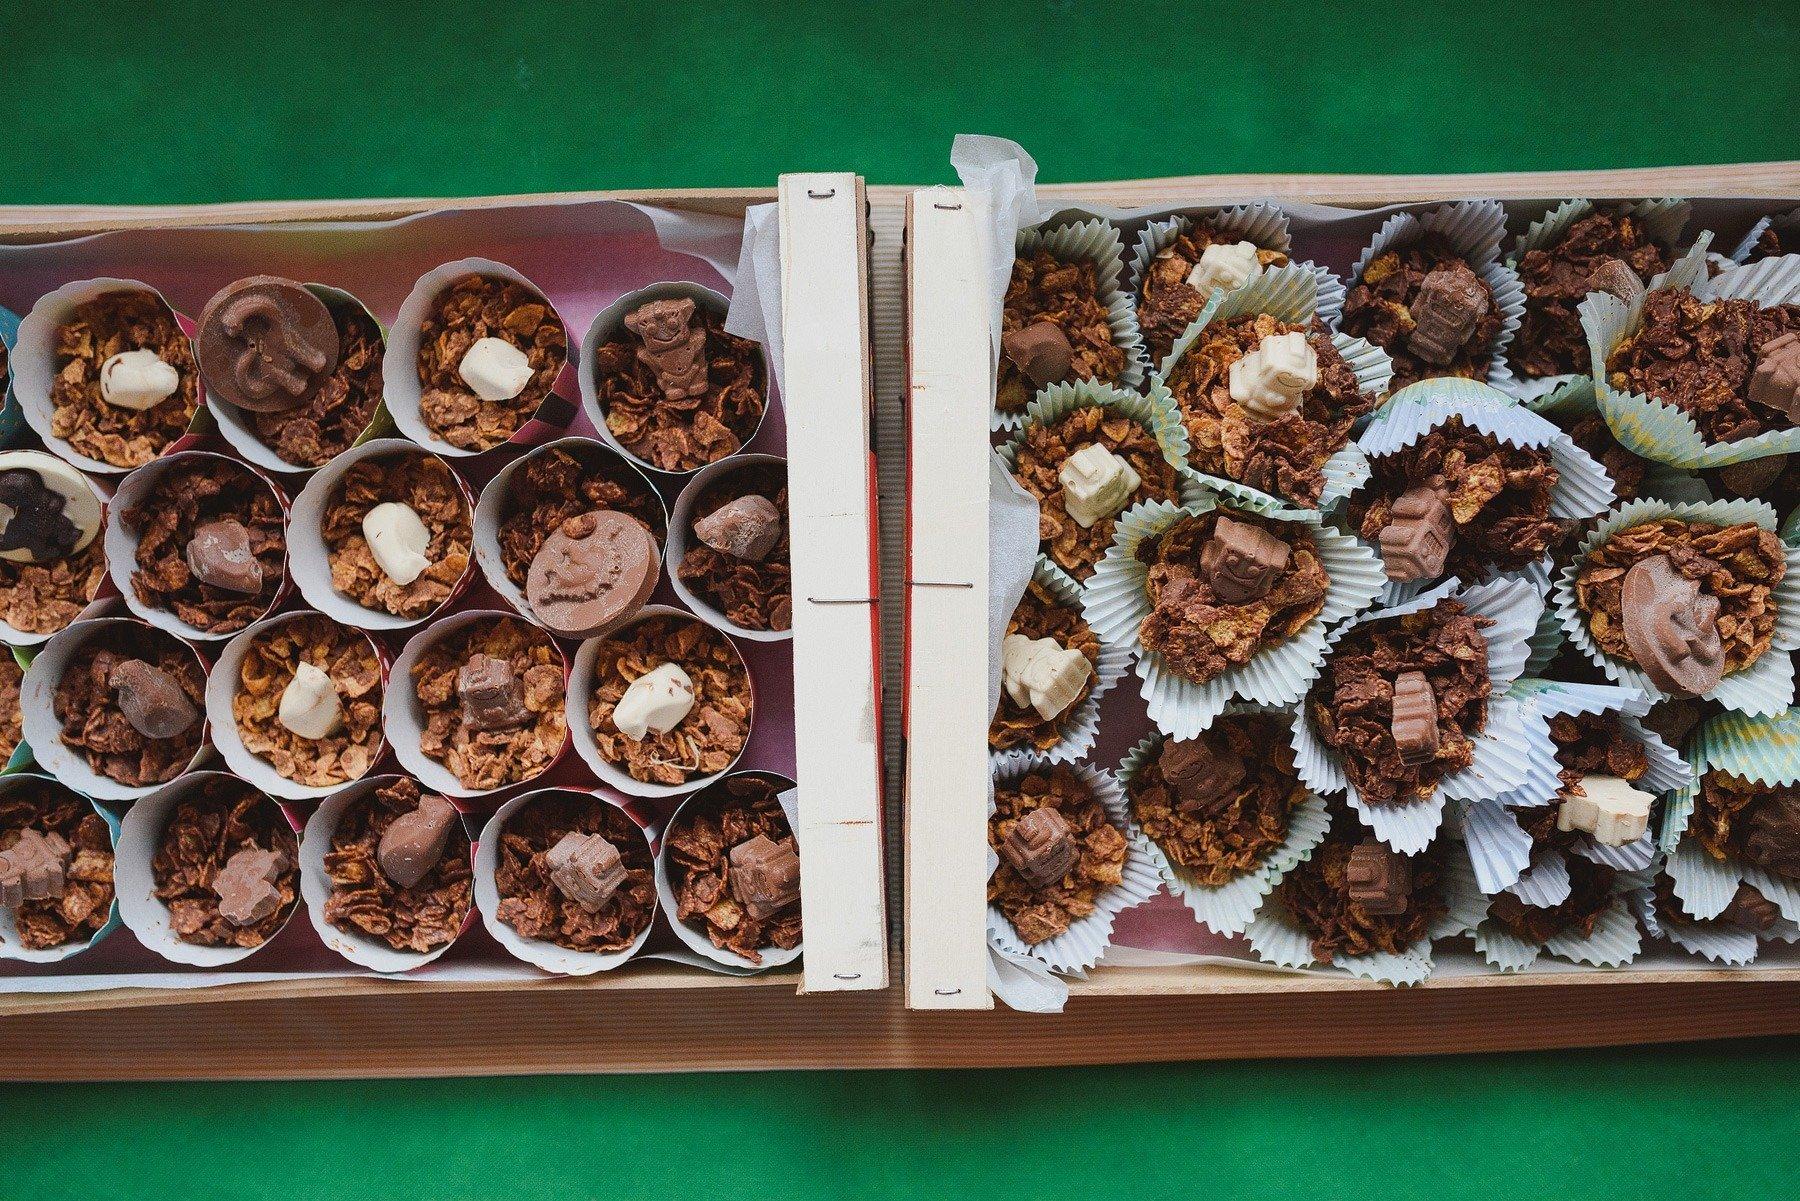 chocolate cornflake cakes at a wedding